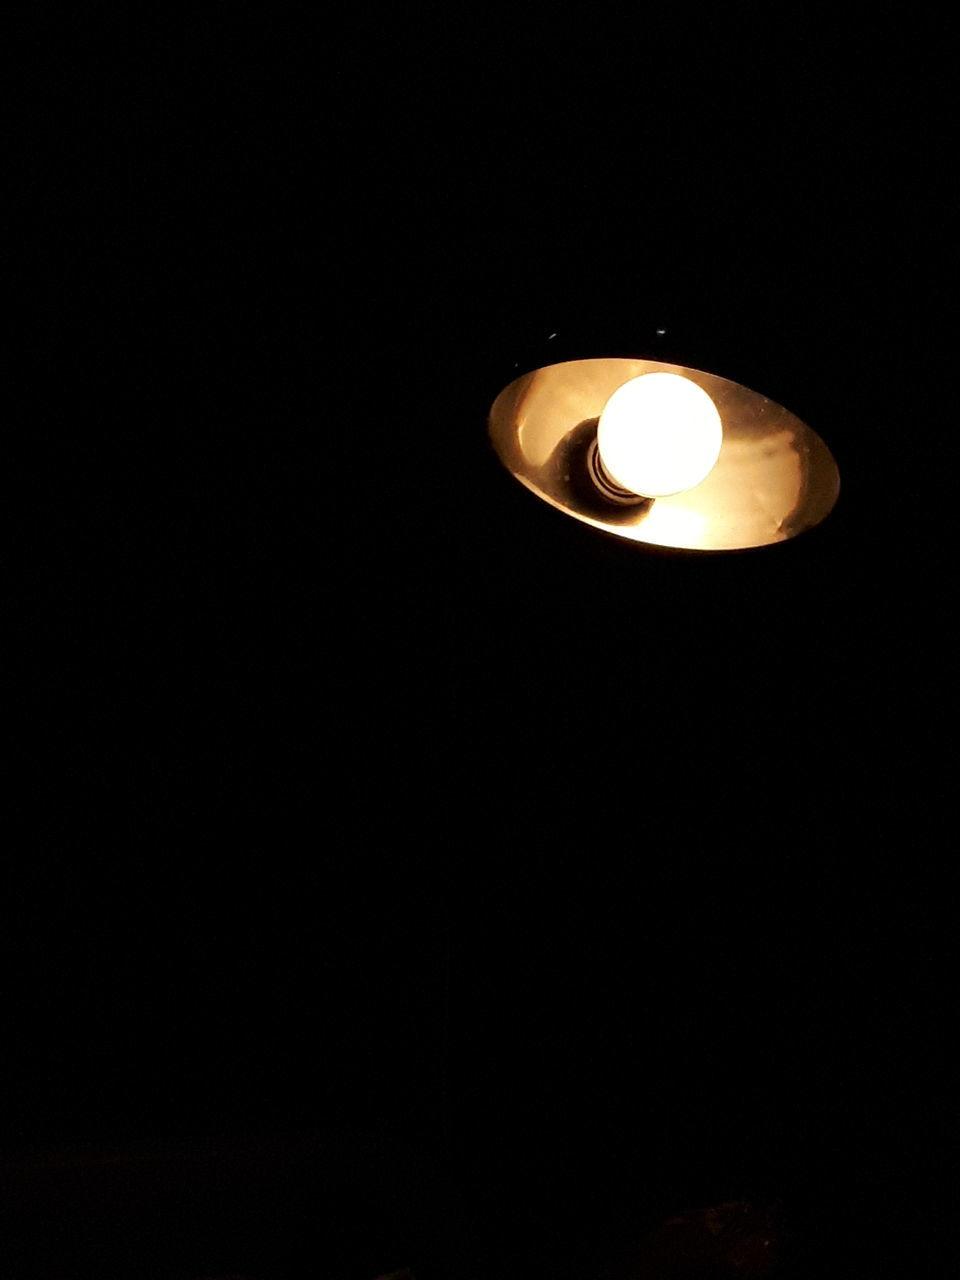 illuminated, flame, copy space, candle, glowing, lighting equipment, heat - temperature, darkroom, studio shot, burning, no people, black background, tea light, indoors, close-up